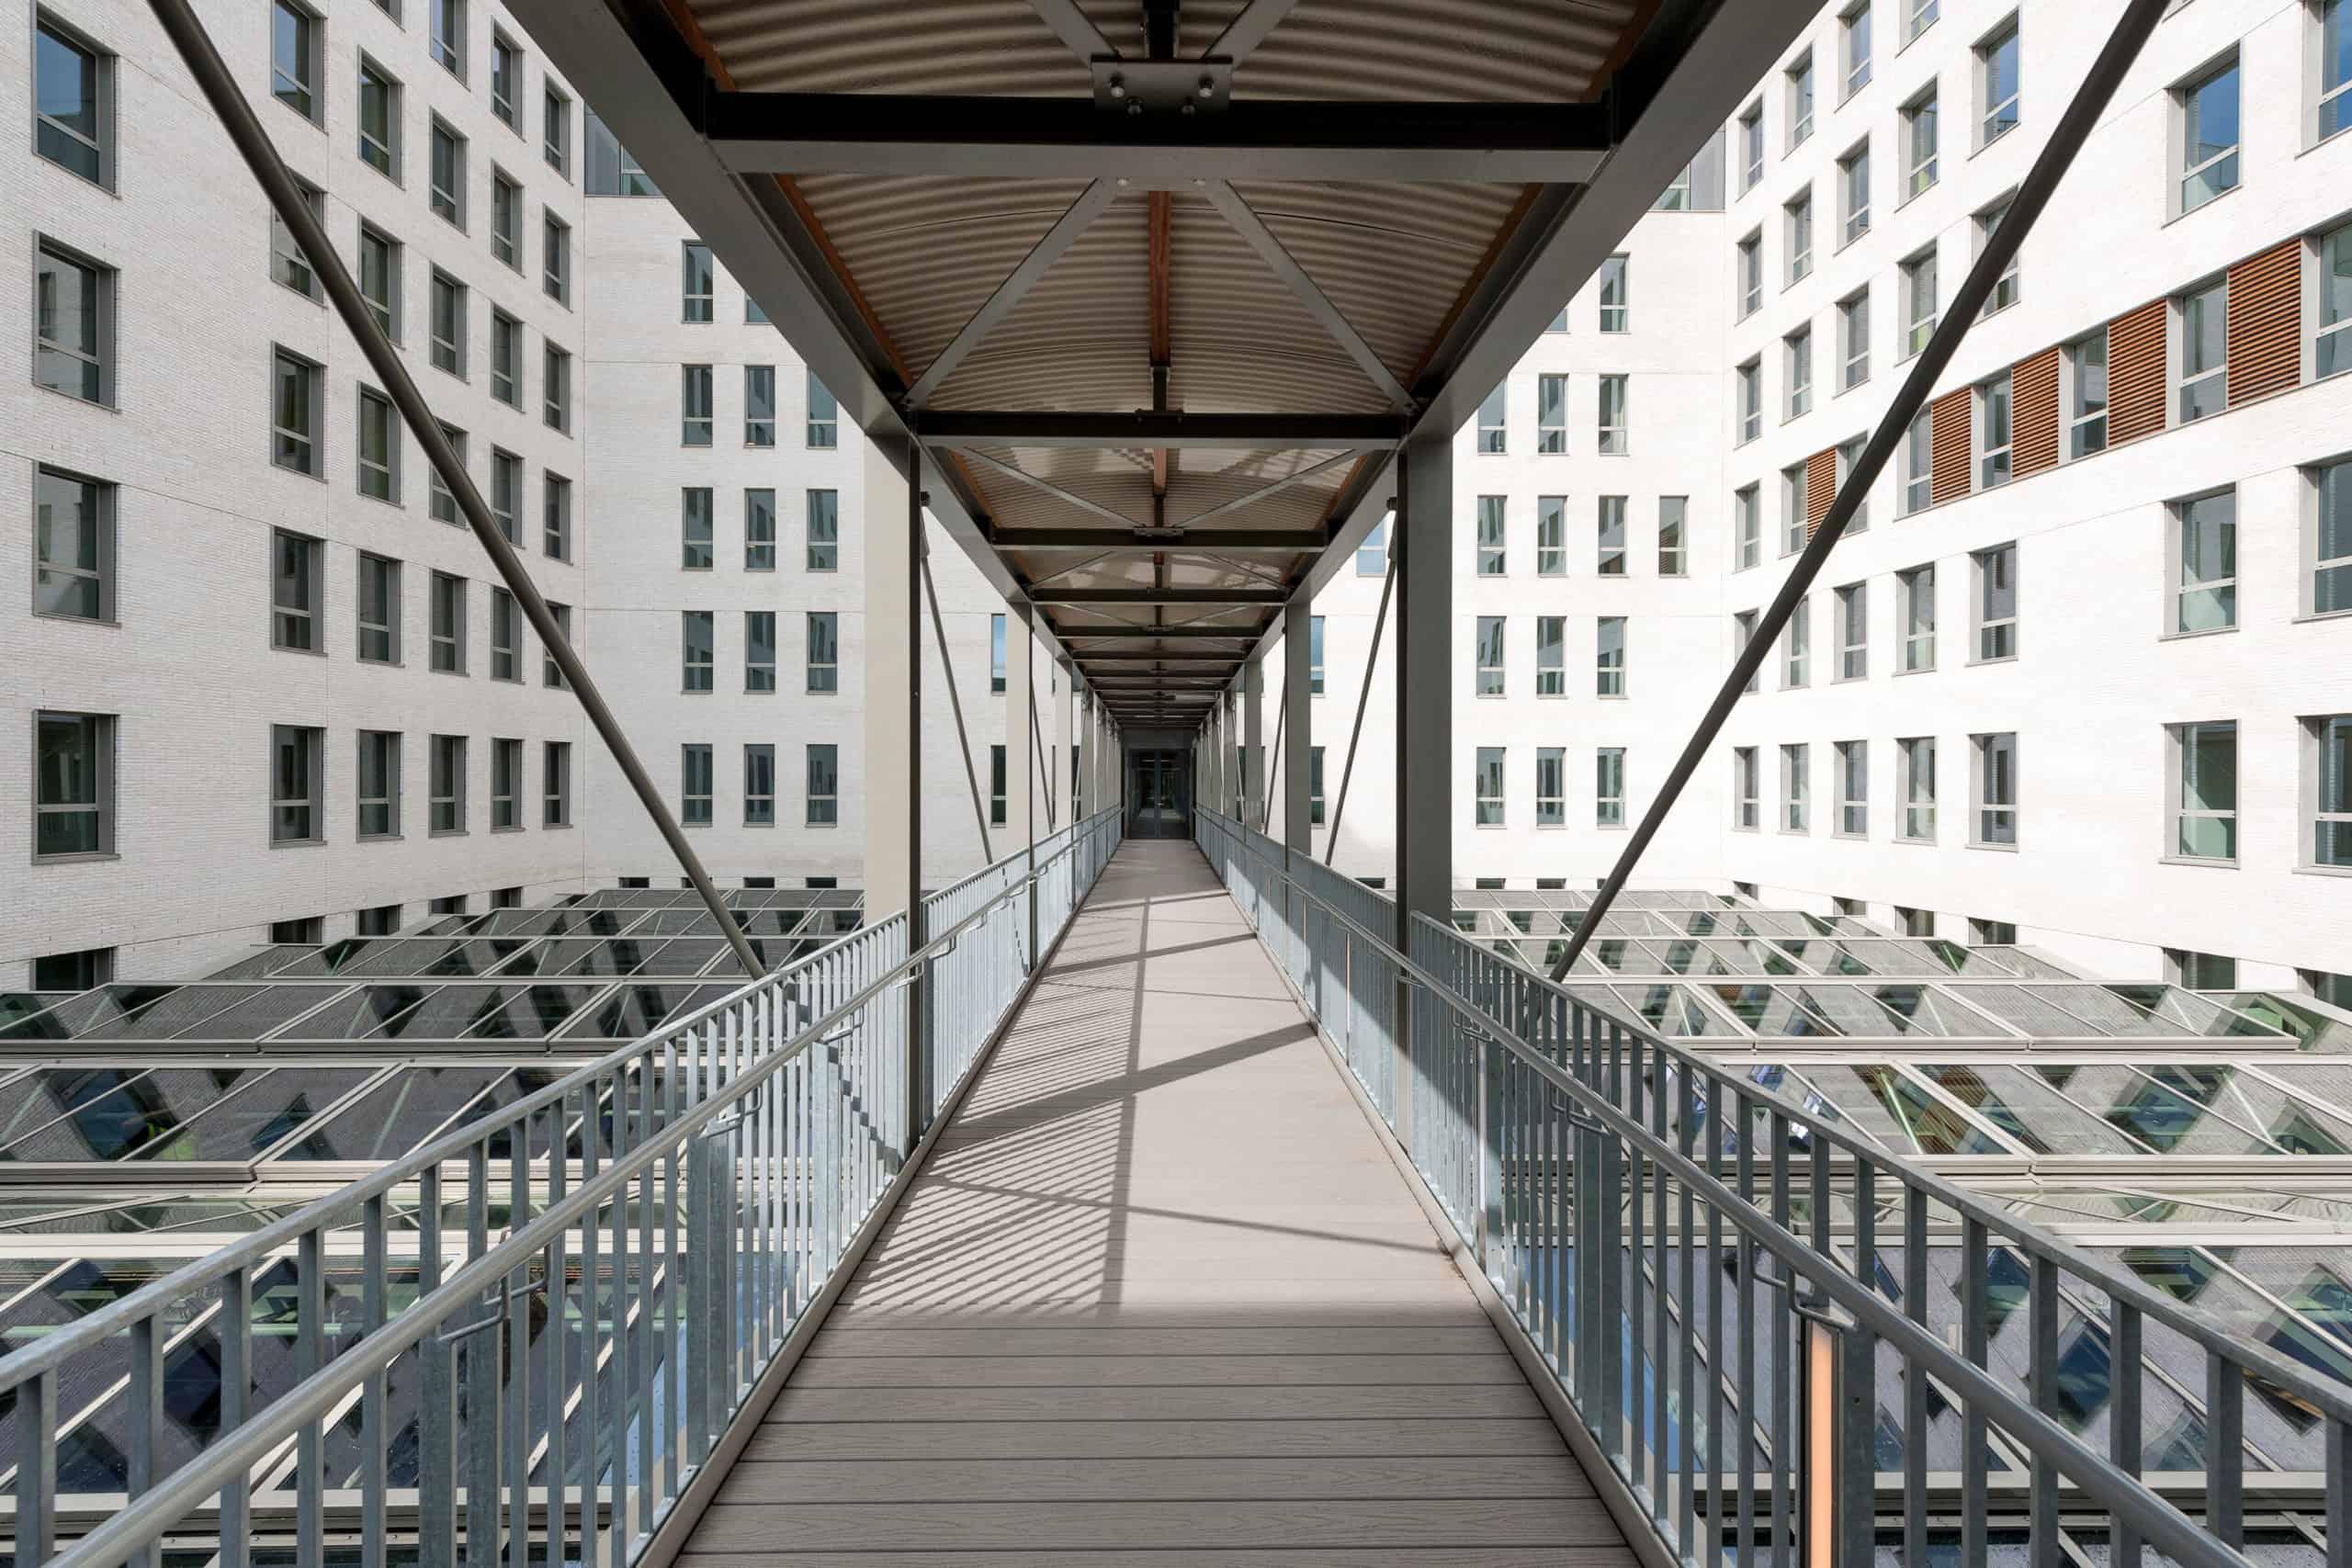 Meander-Medisch-Centrum-3-©-Dirk-Verwoerd-Atelier-Pro-4-scaled